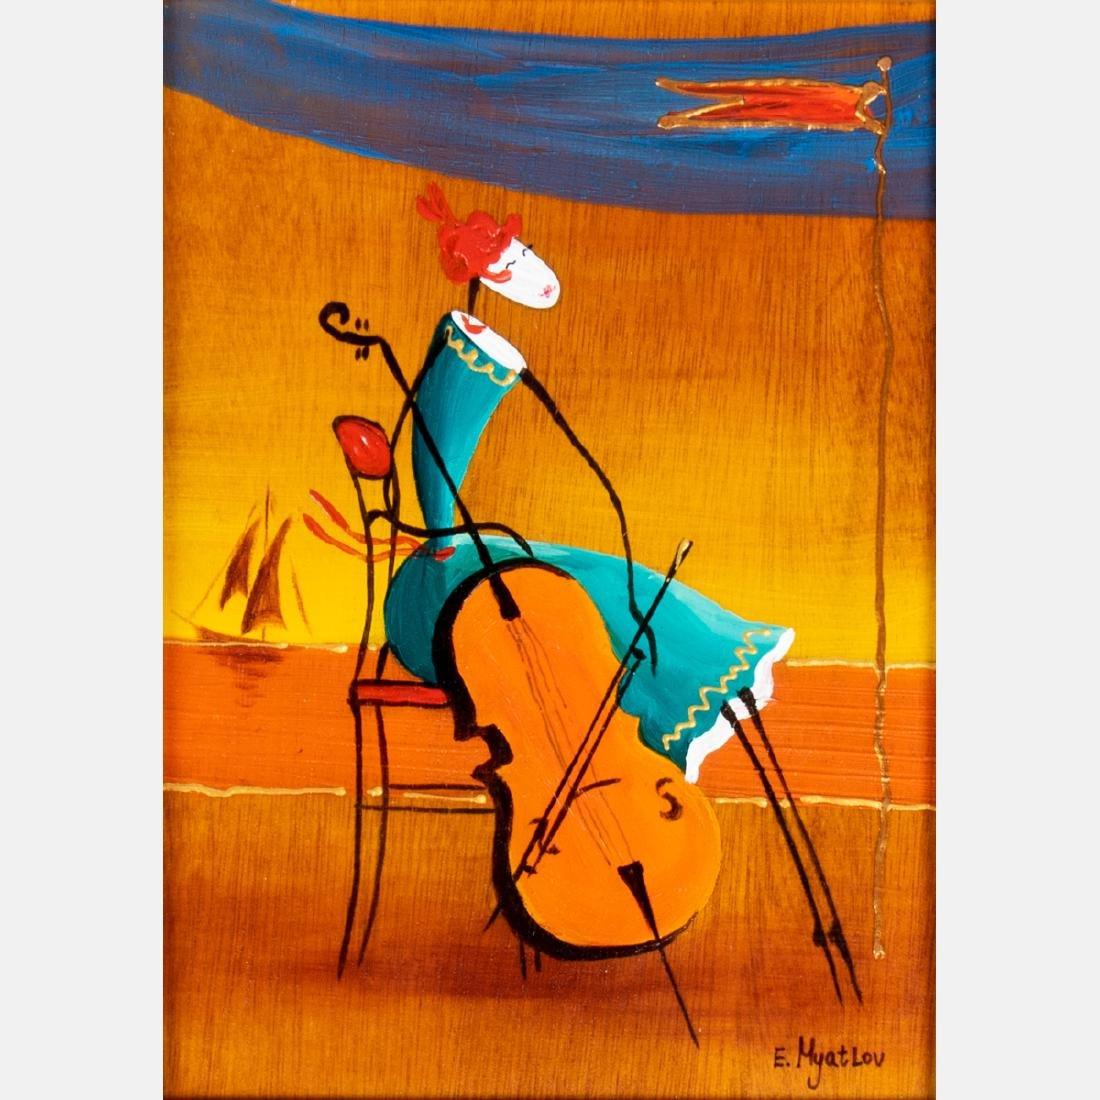 Ester Myatlov (b. 1976) 'Reaching for You', 'Wind - 3